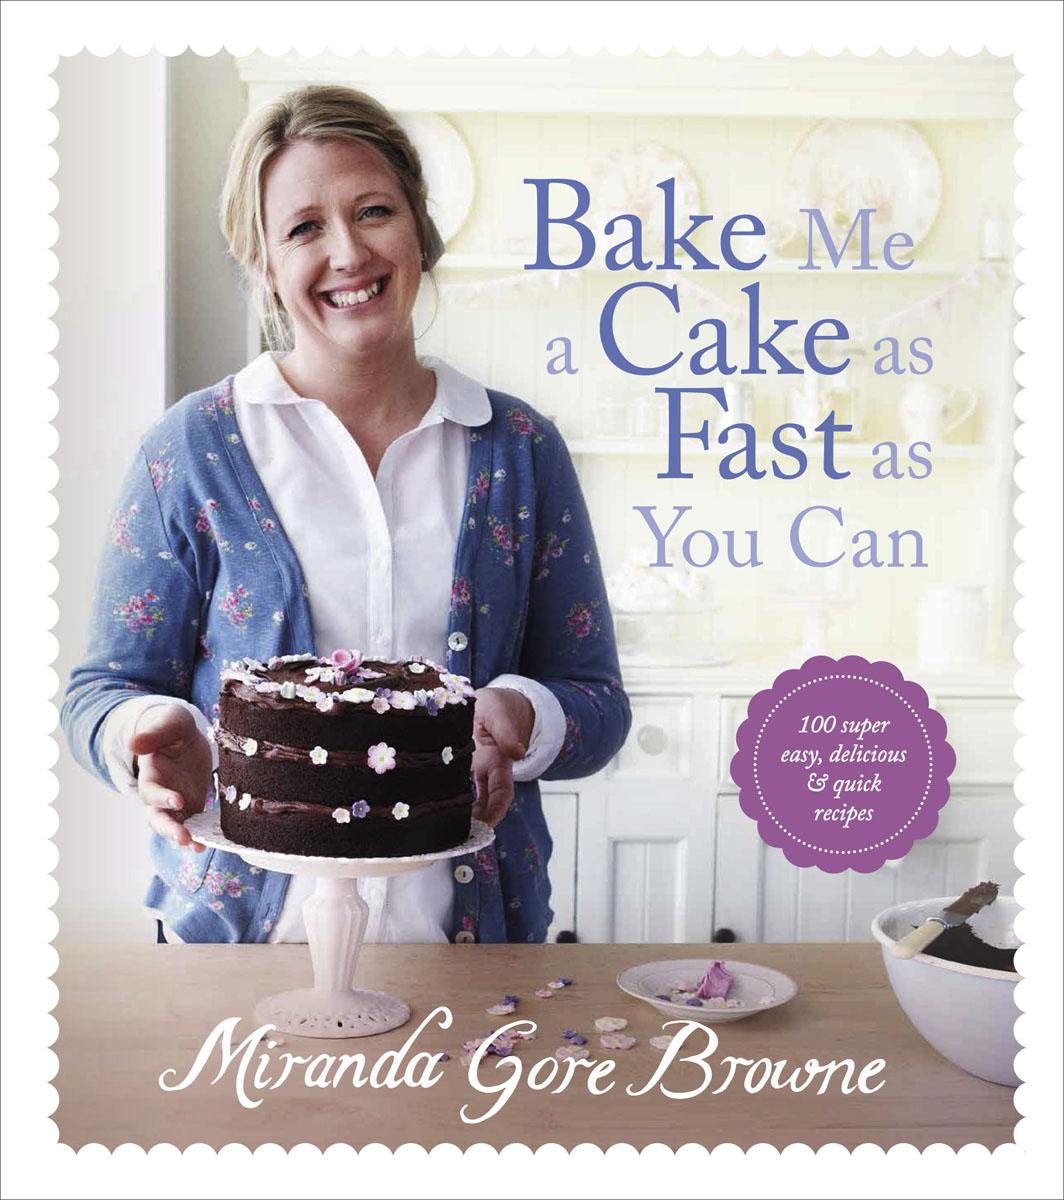 Gore Browne, Miranda Bake Me a Cake as Fast as You Can ken browne sociology for as aqa